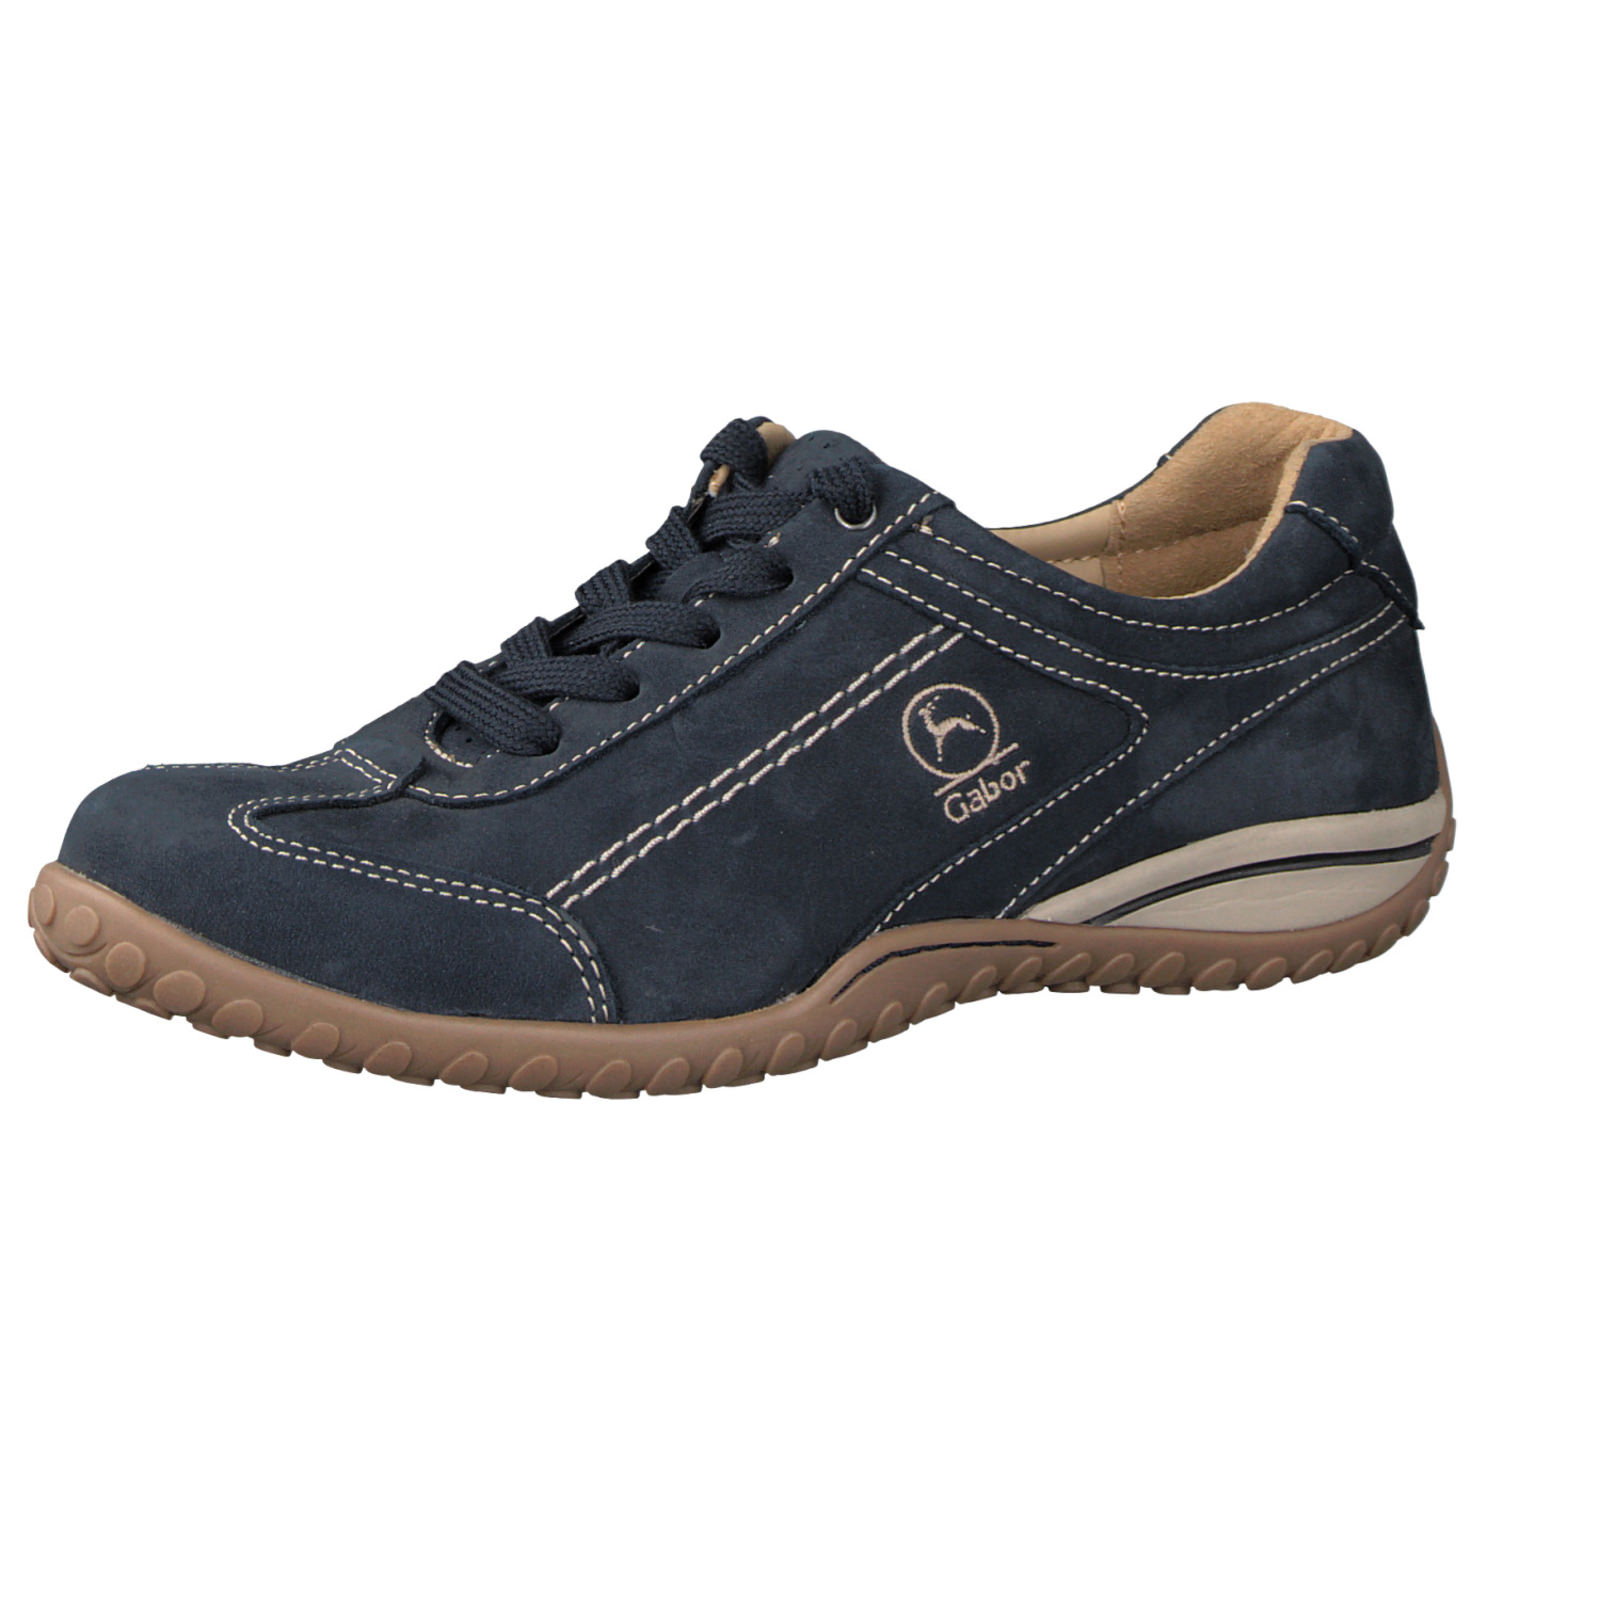 gabor comfort damen sneaker in dunkelblau kaufen zumnorde online shop. Black Bedroom Furniture Sets. Home Design Ideas